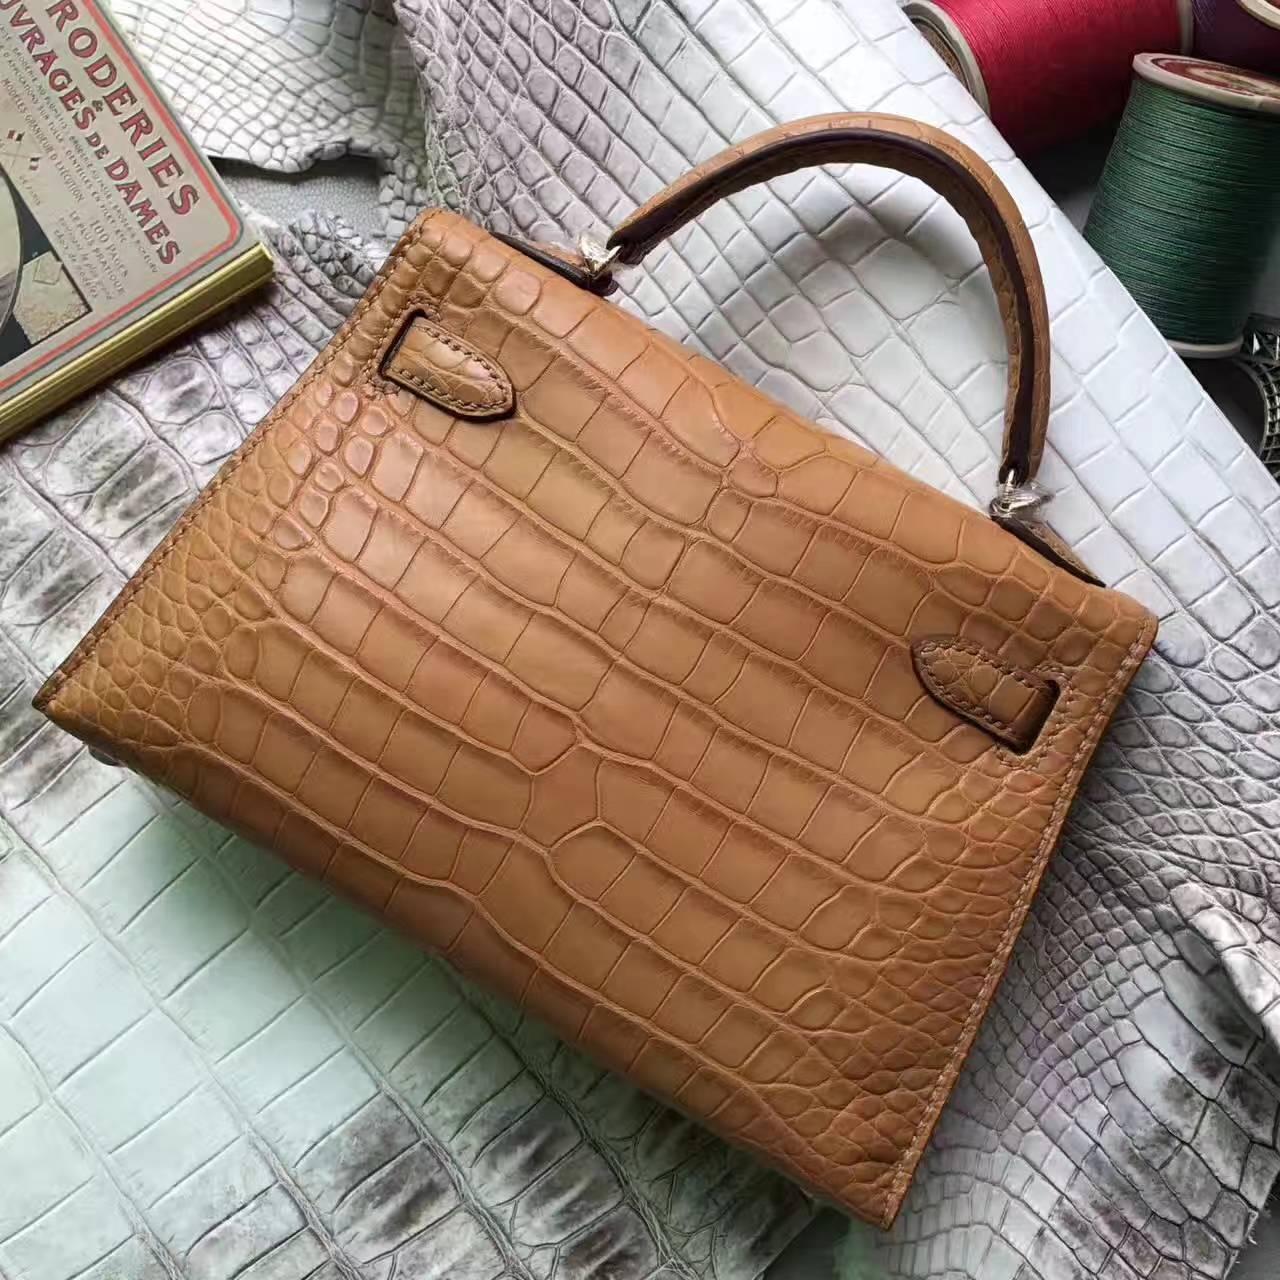 Wholesale Hermes Cognac Crocodile Shiny Leather Minikelly-2 Handbag